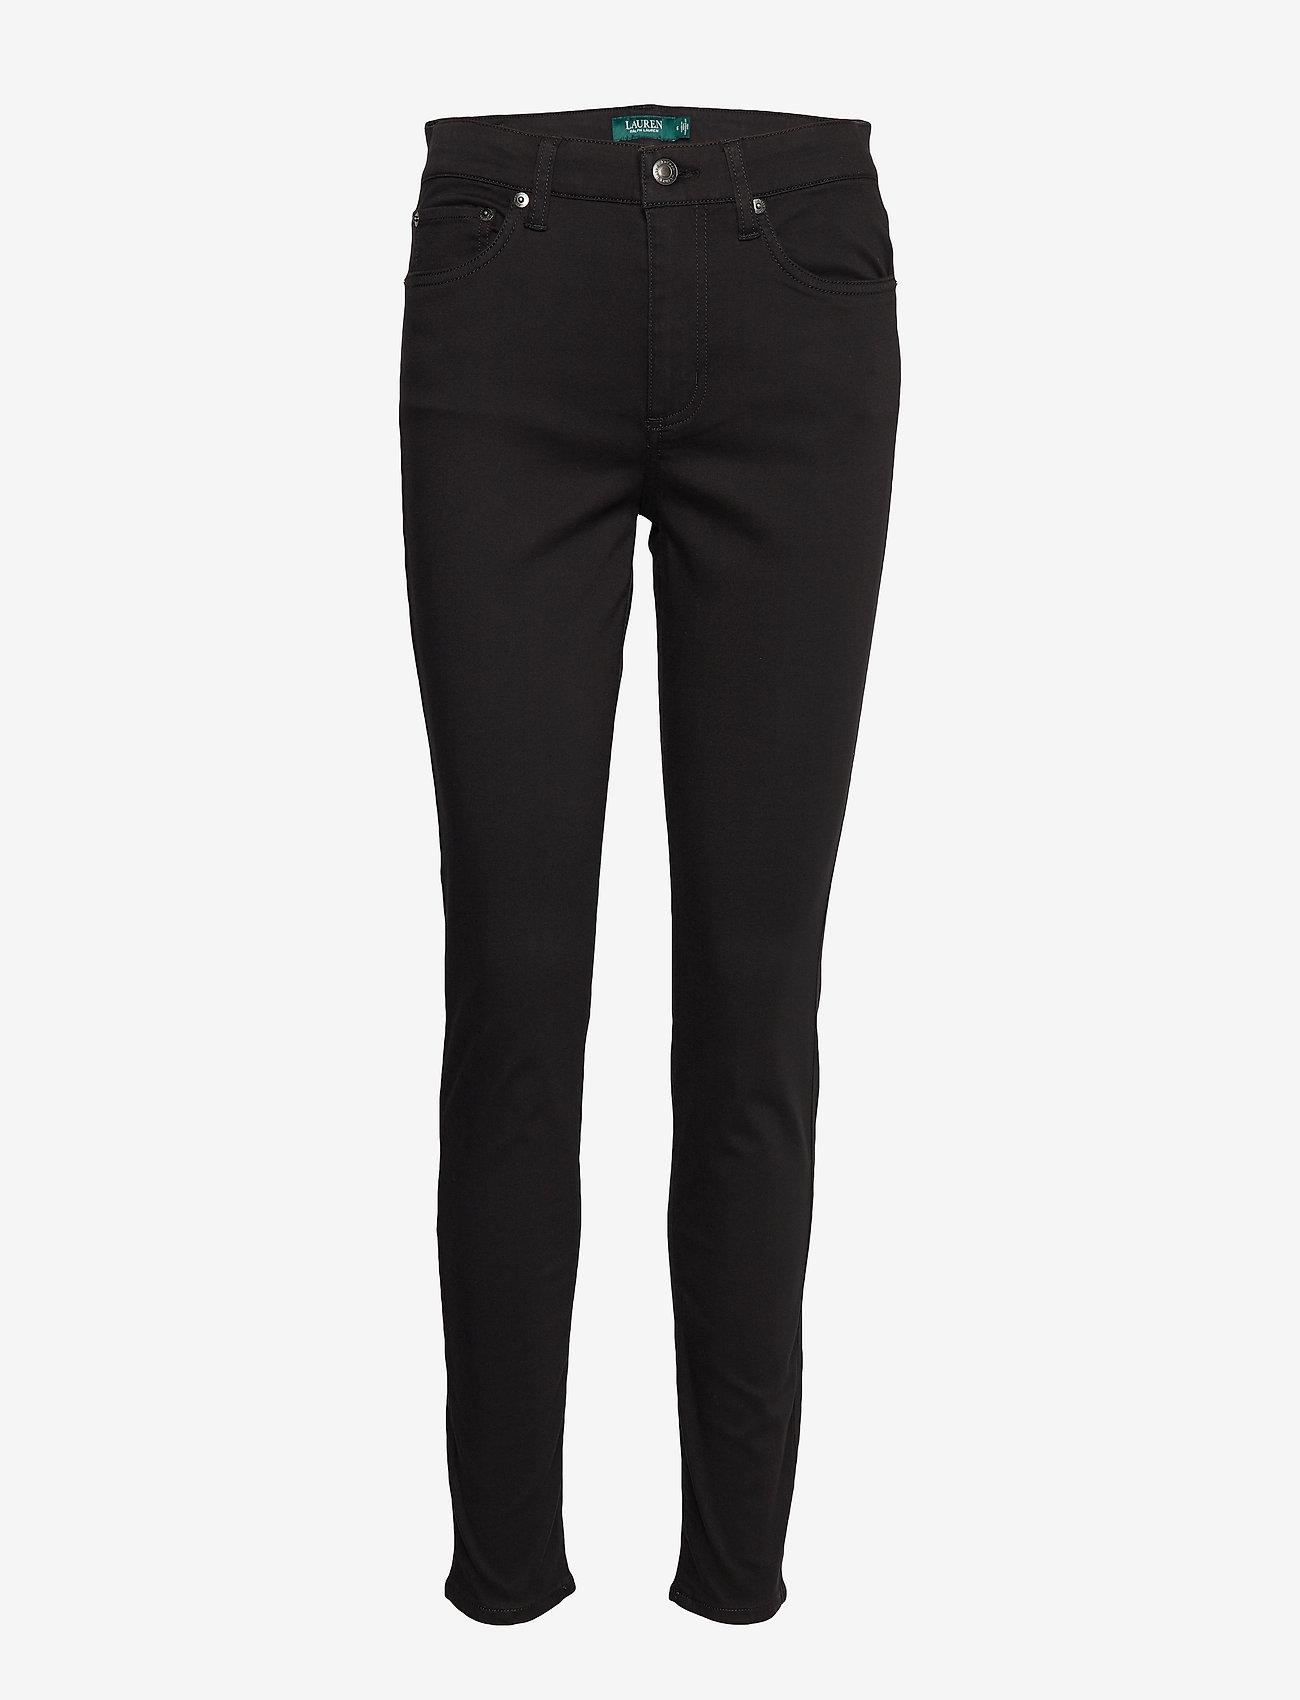 Lauren Ralph Lauren - PCDYE WASHED SATEEN-PANT - broeken med skinny fit - polo black - 0